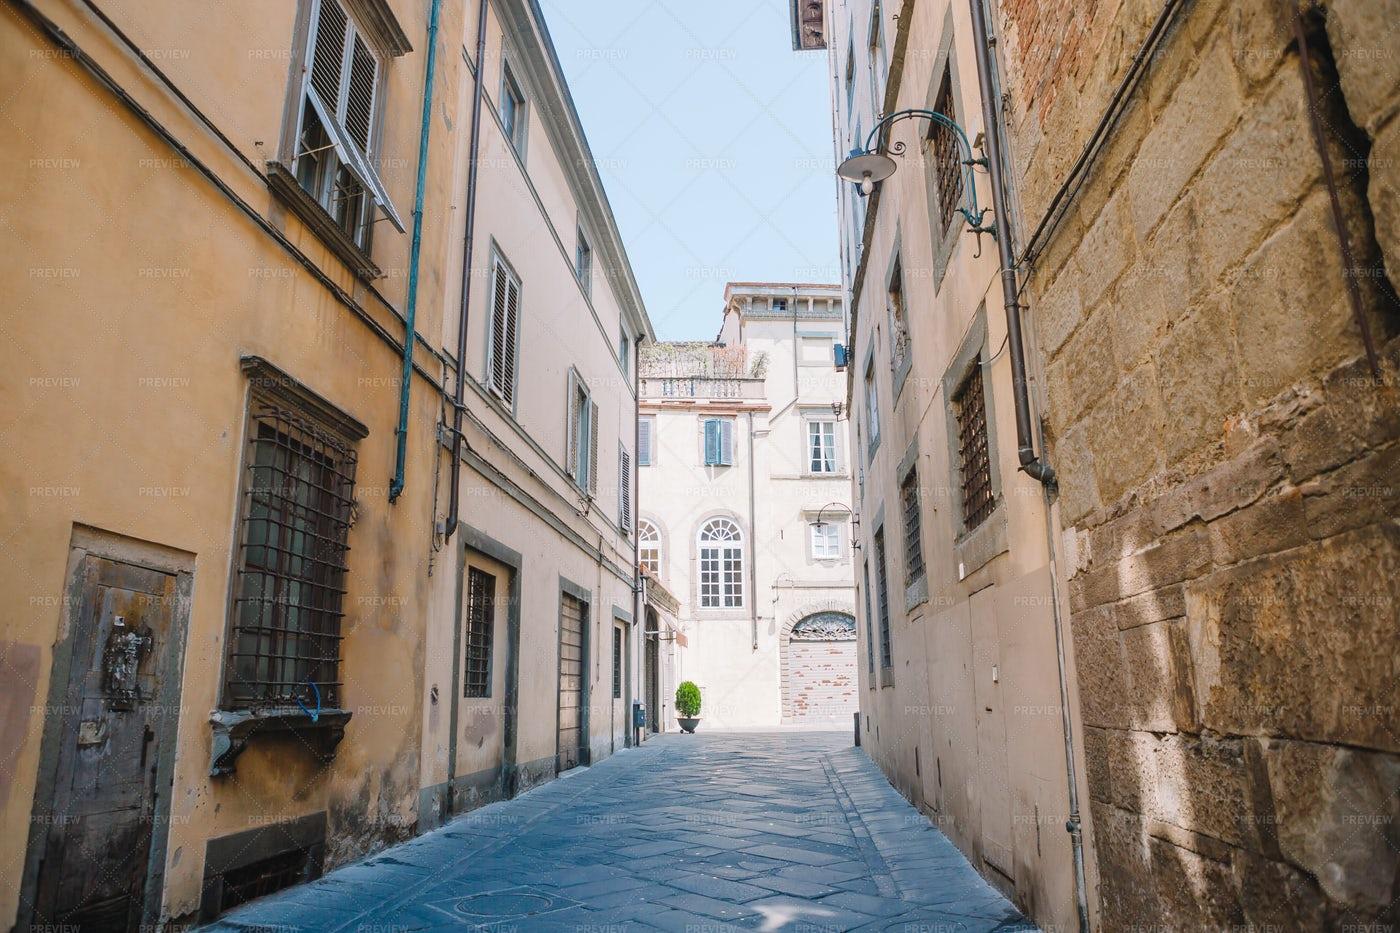 Narrow Streets Of Europe: Stock Photos